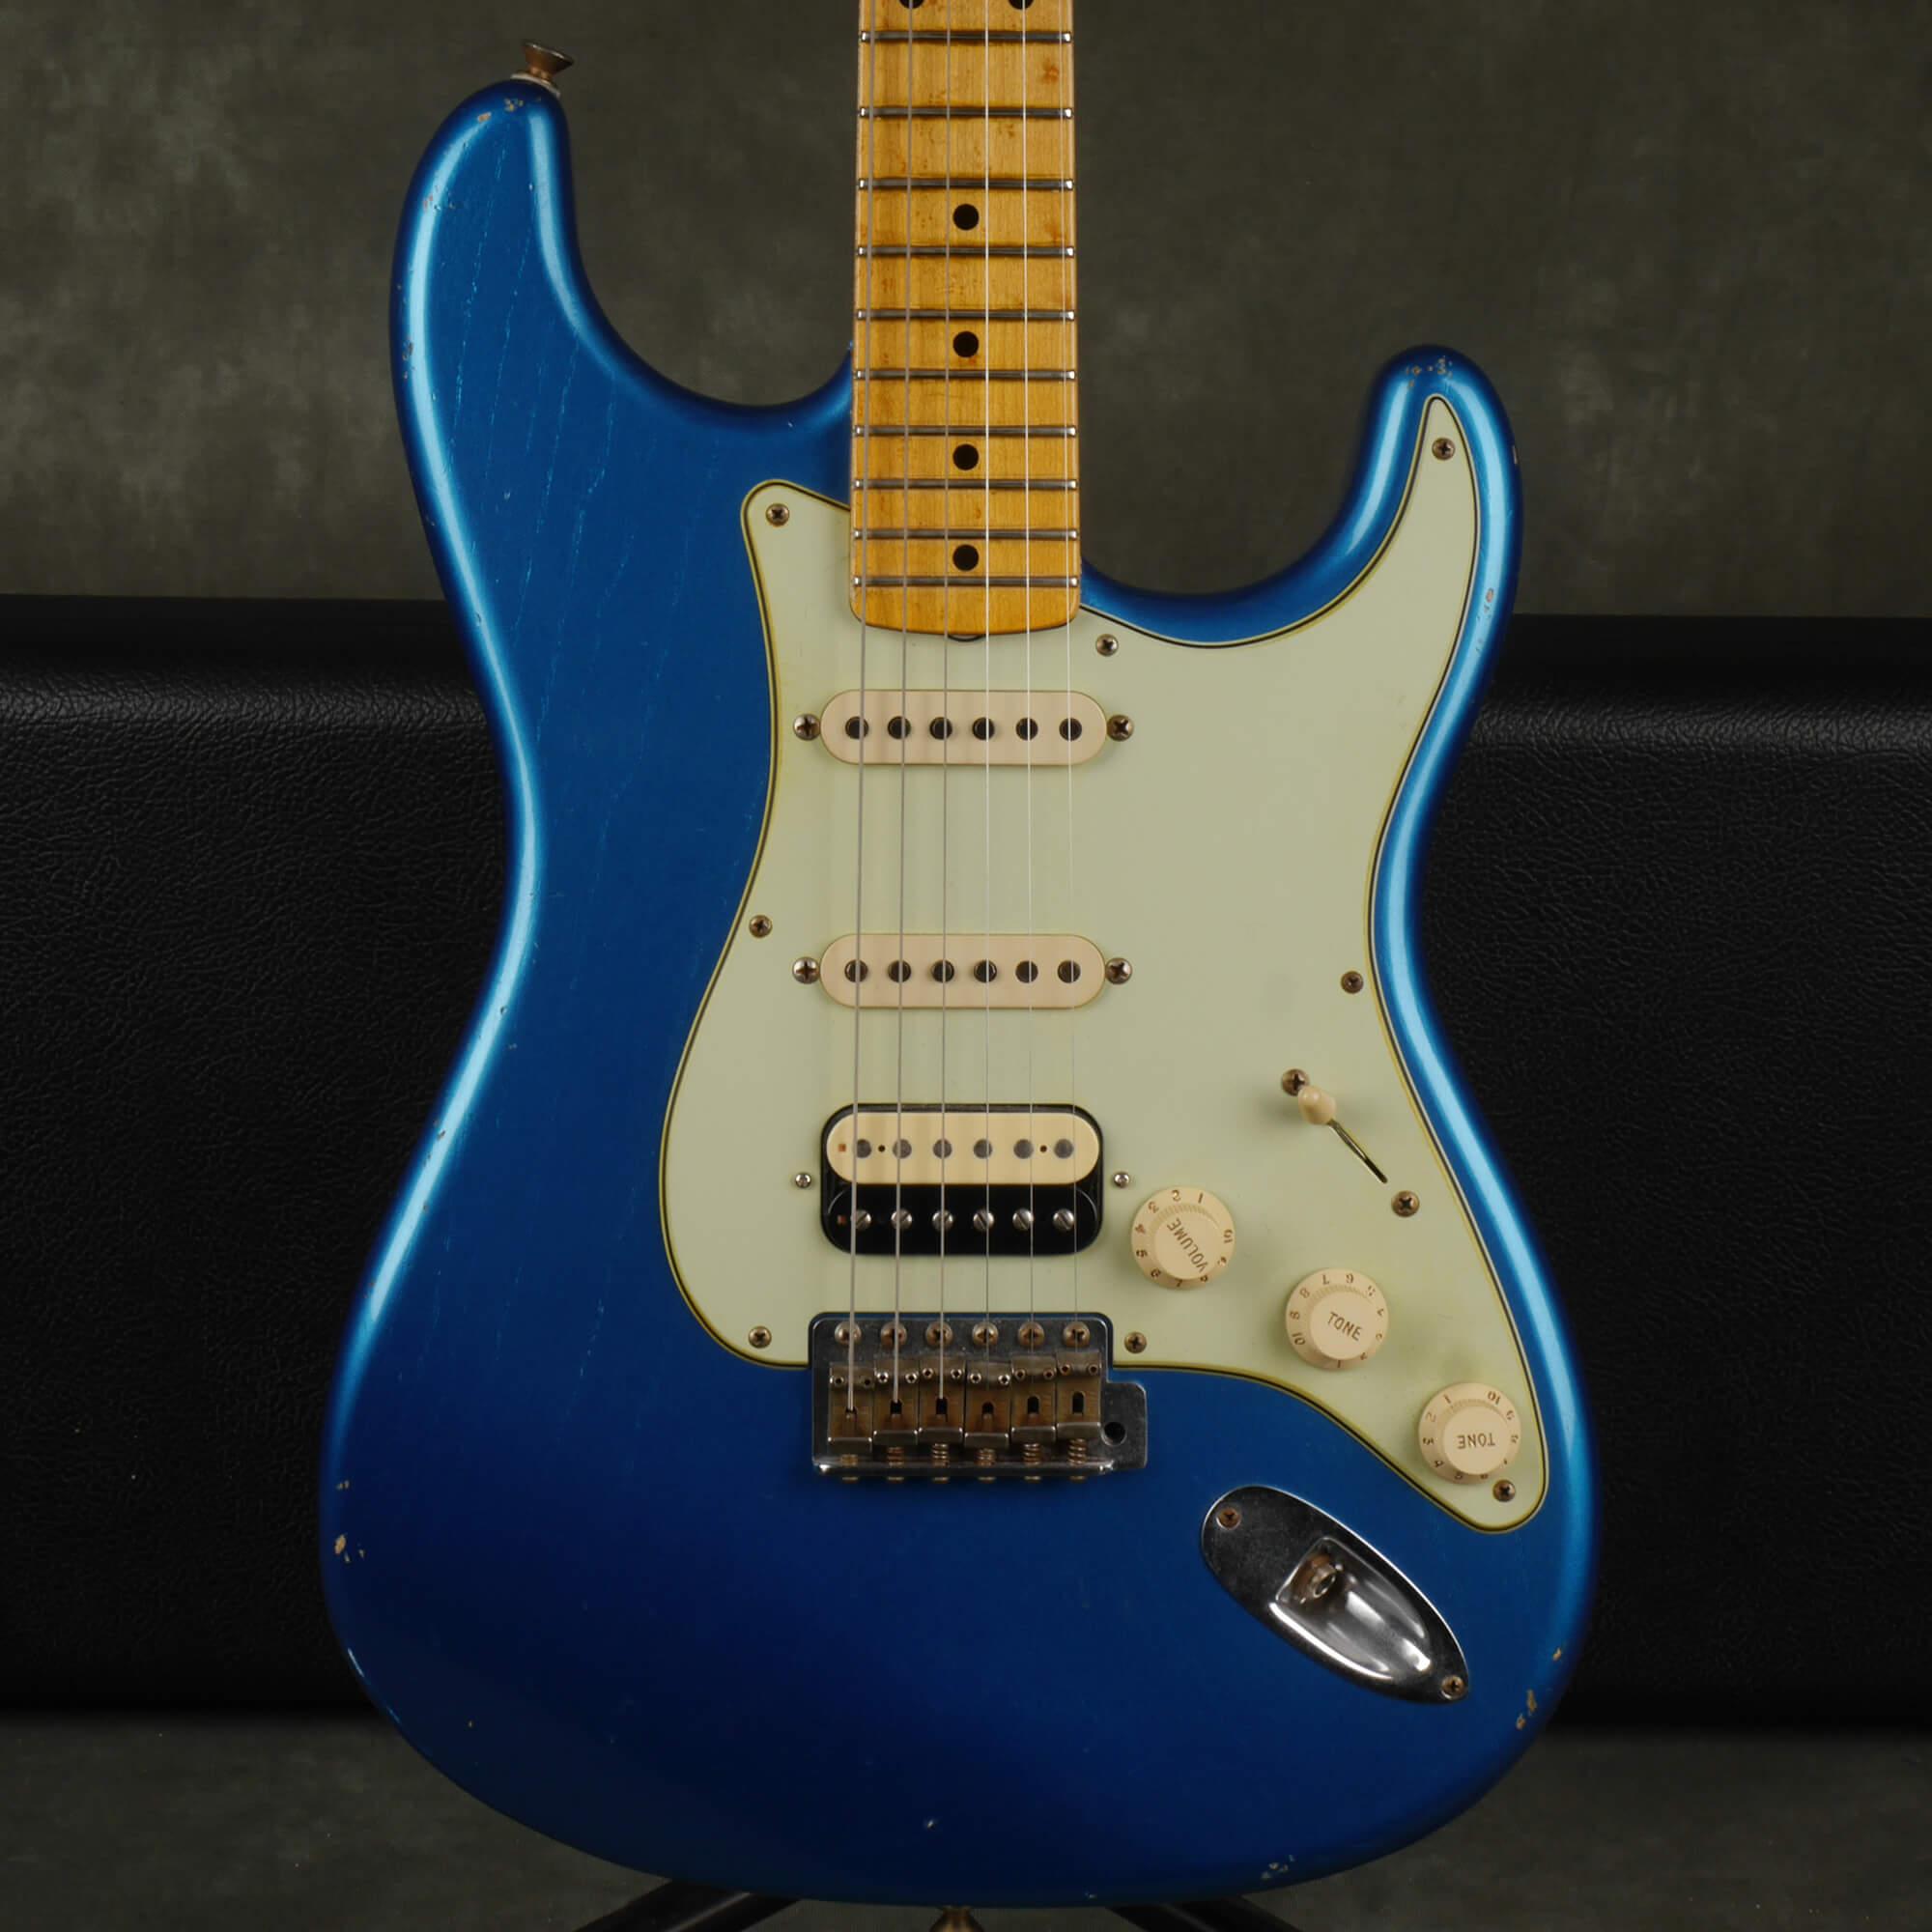 Fender Custom Shop HSS Stratocaster Electric Guitar - Blue w/Case - 2nd Hand